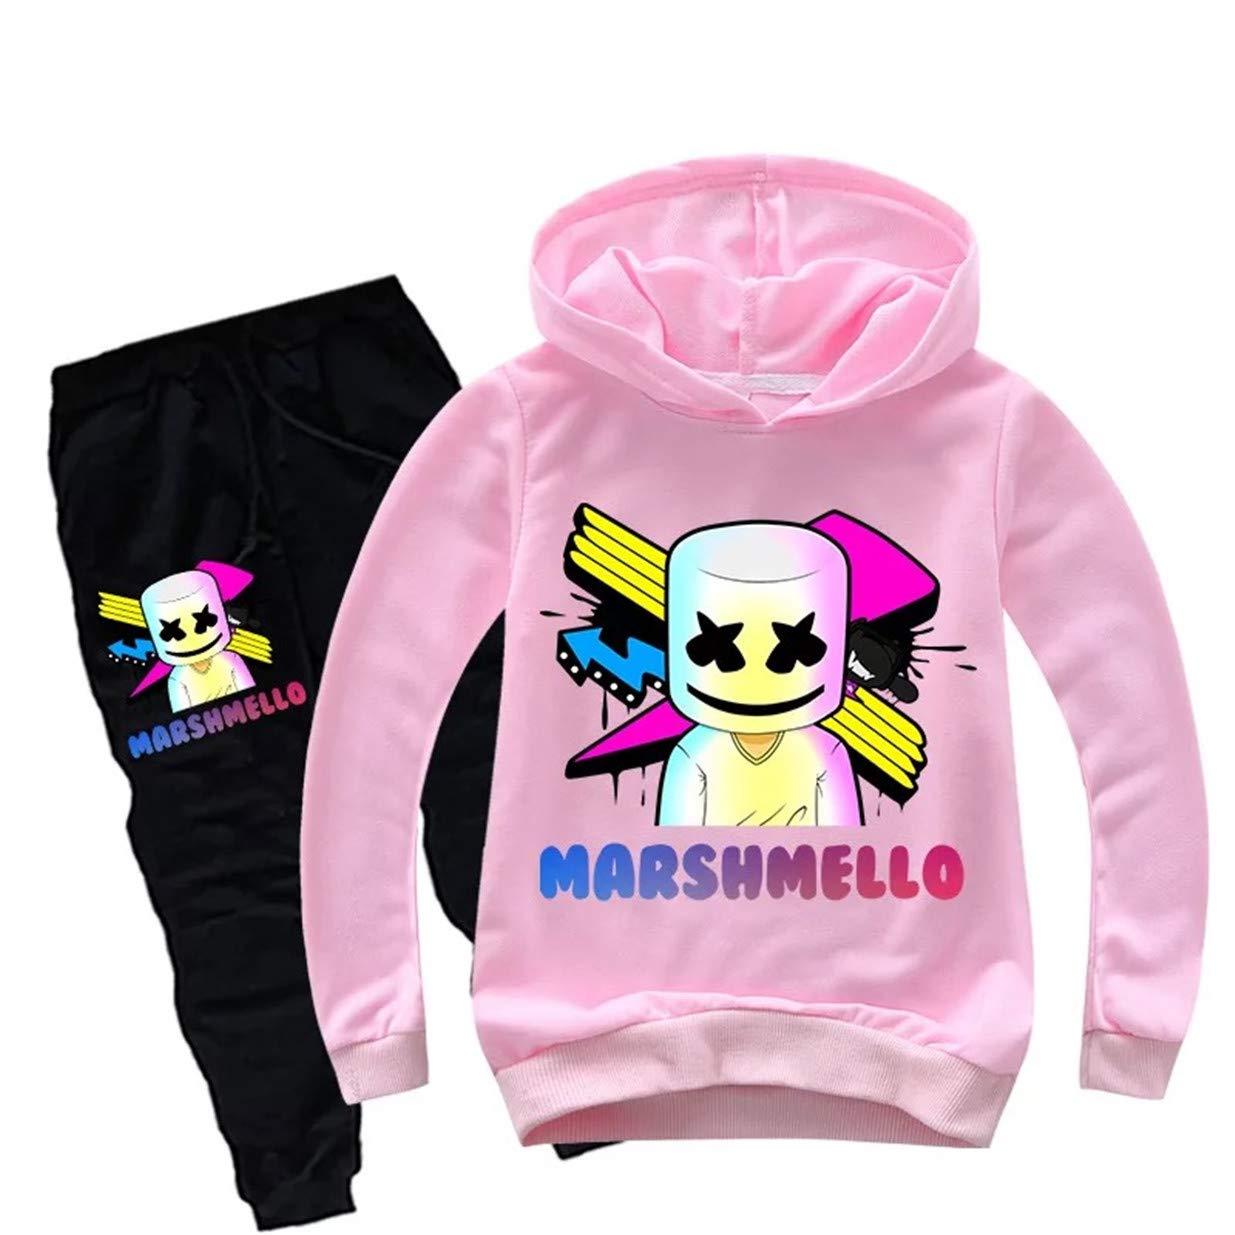 Ku-lee Kids DJ Marshmello Hoodie and Pants Set-3D Printed Long Sleeve Hooded Tops for Boys Girls